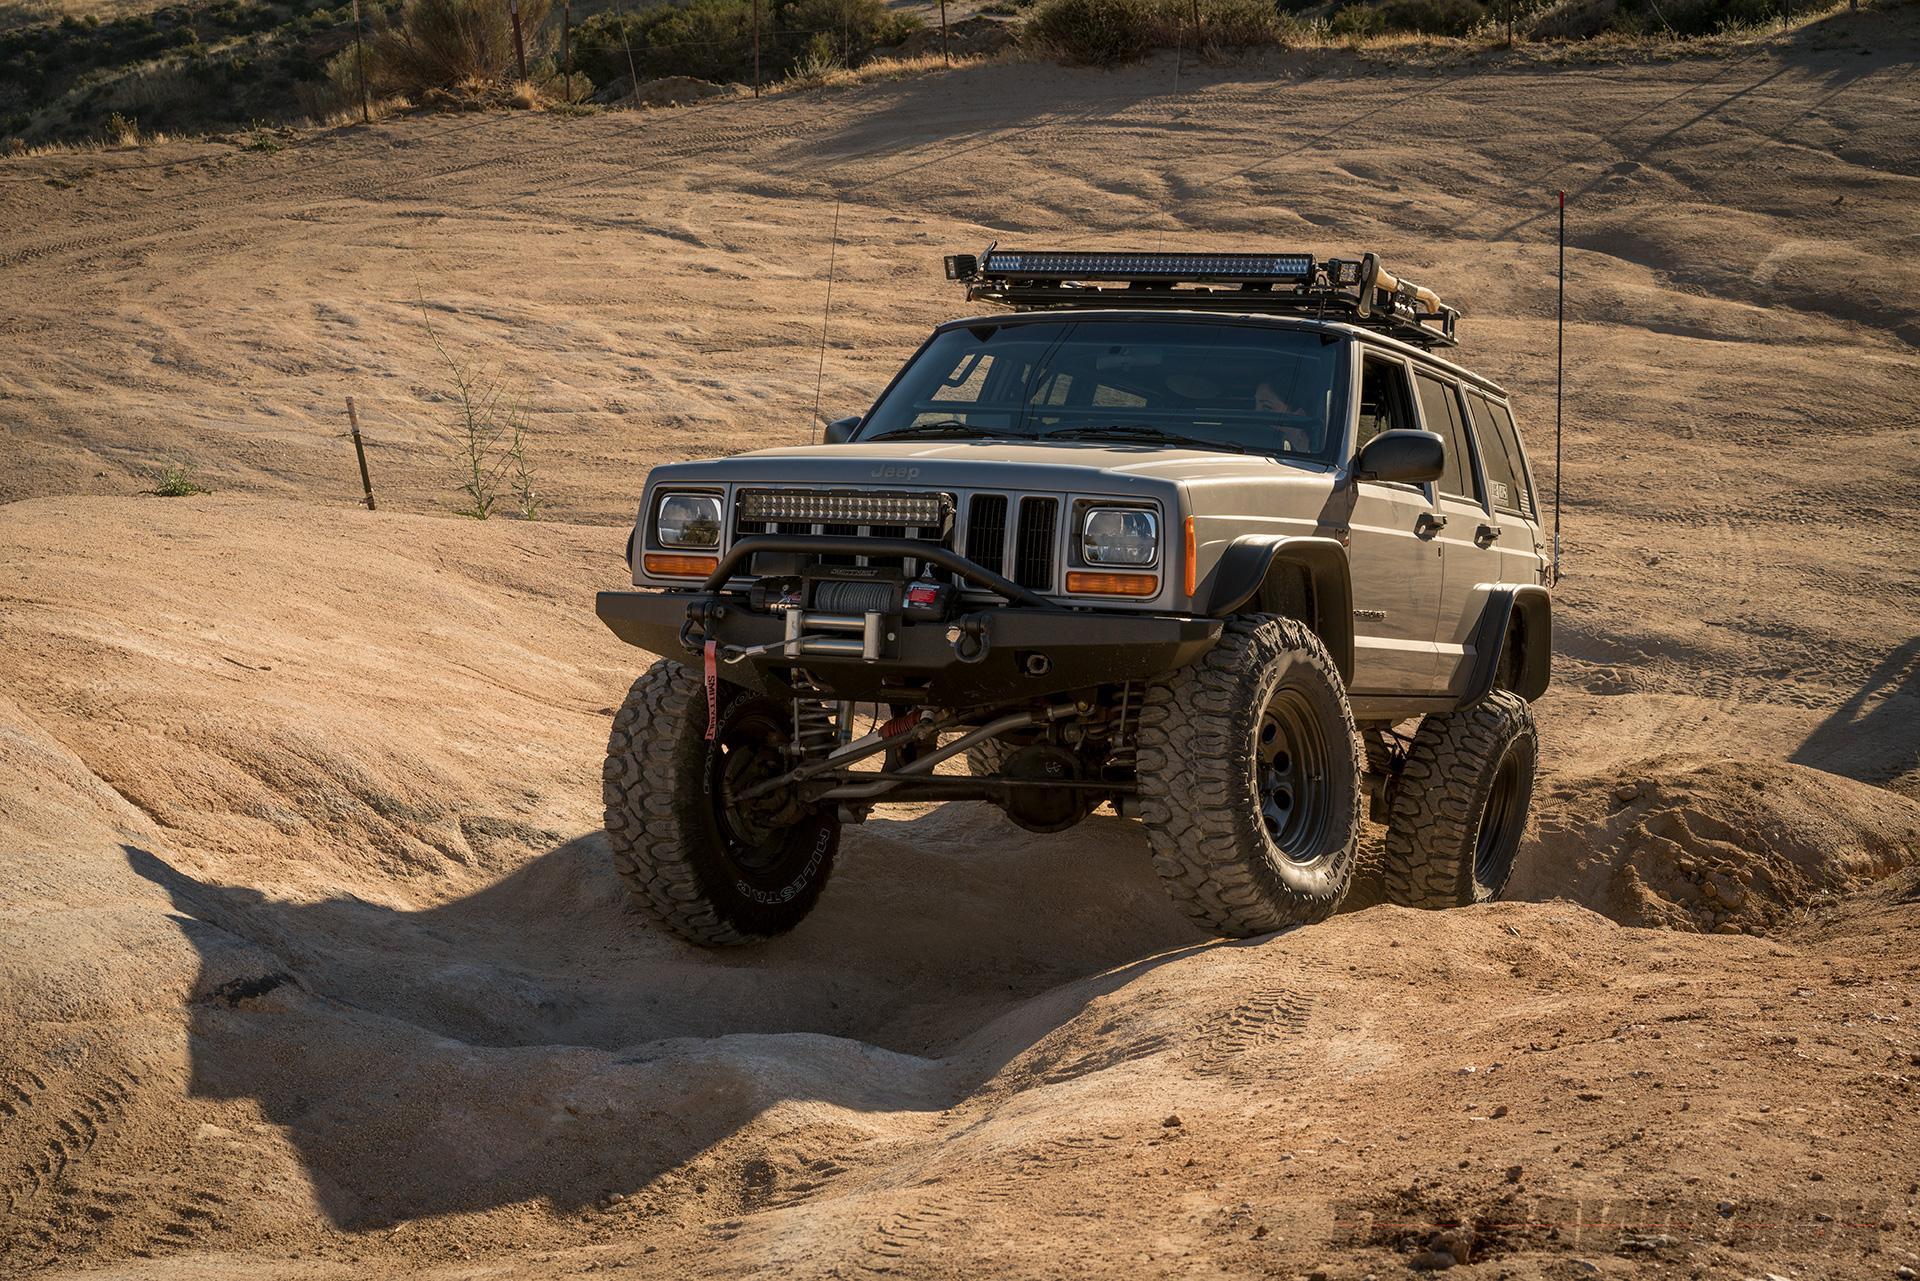 Grey Jeep Grand Cherokee crawling up some rocks